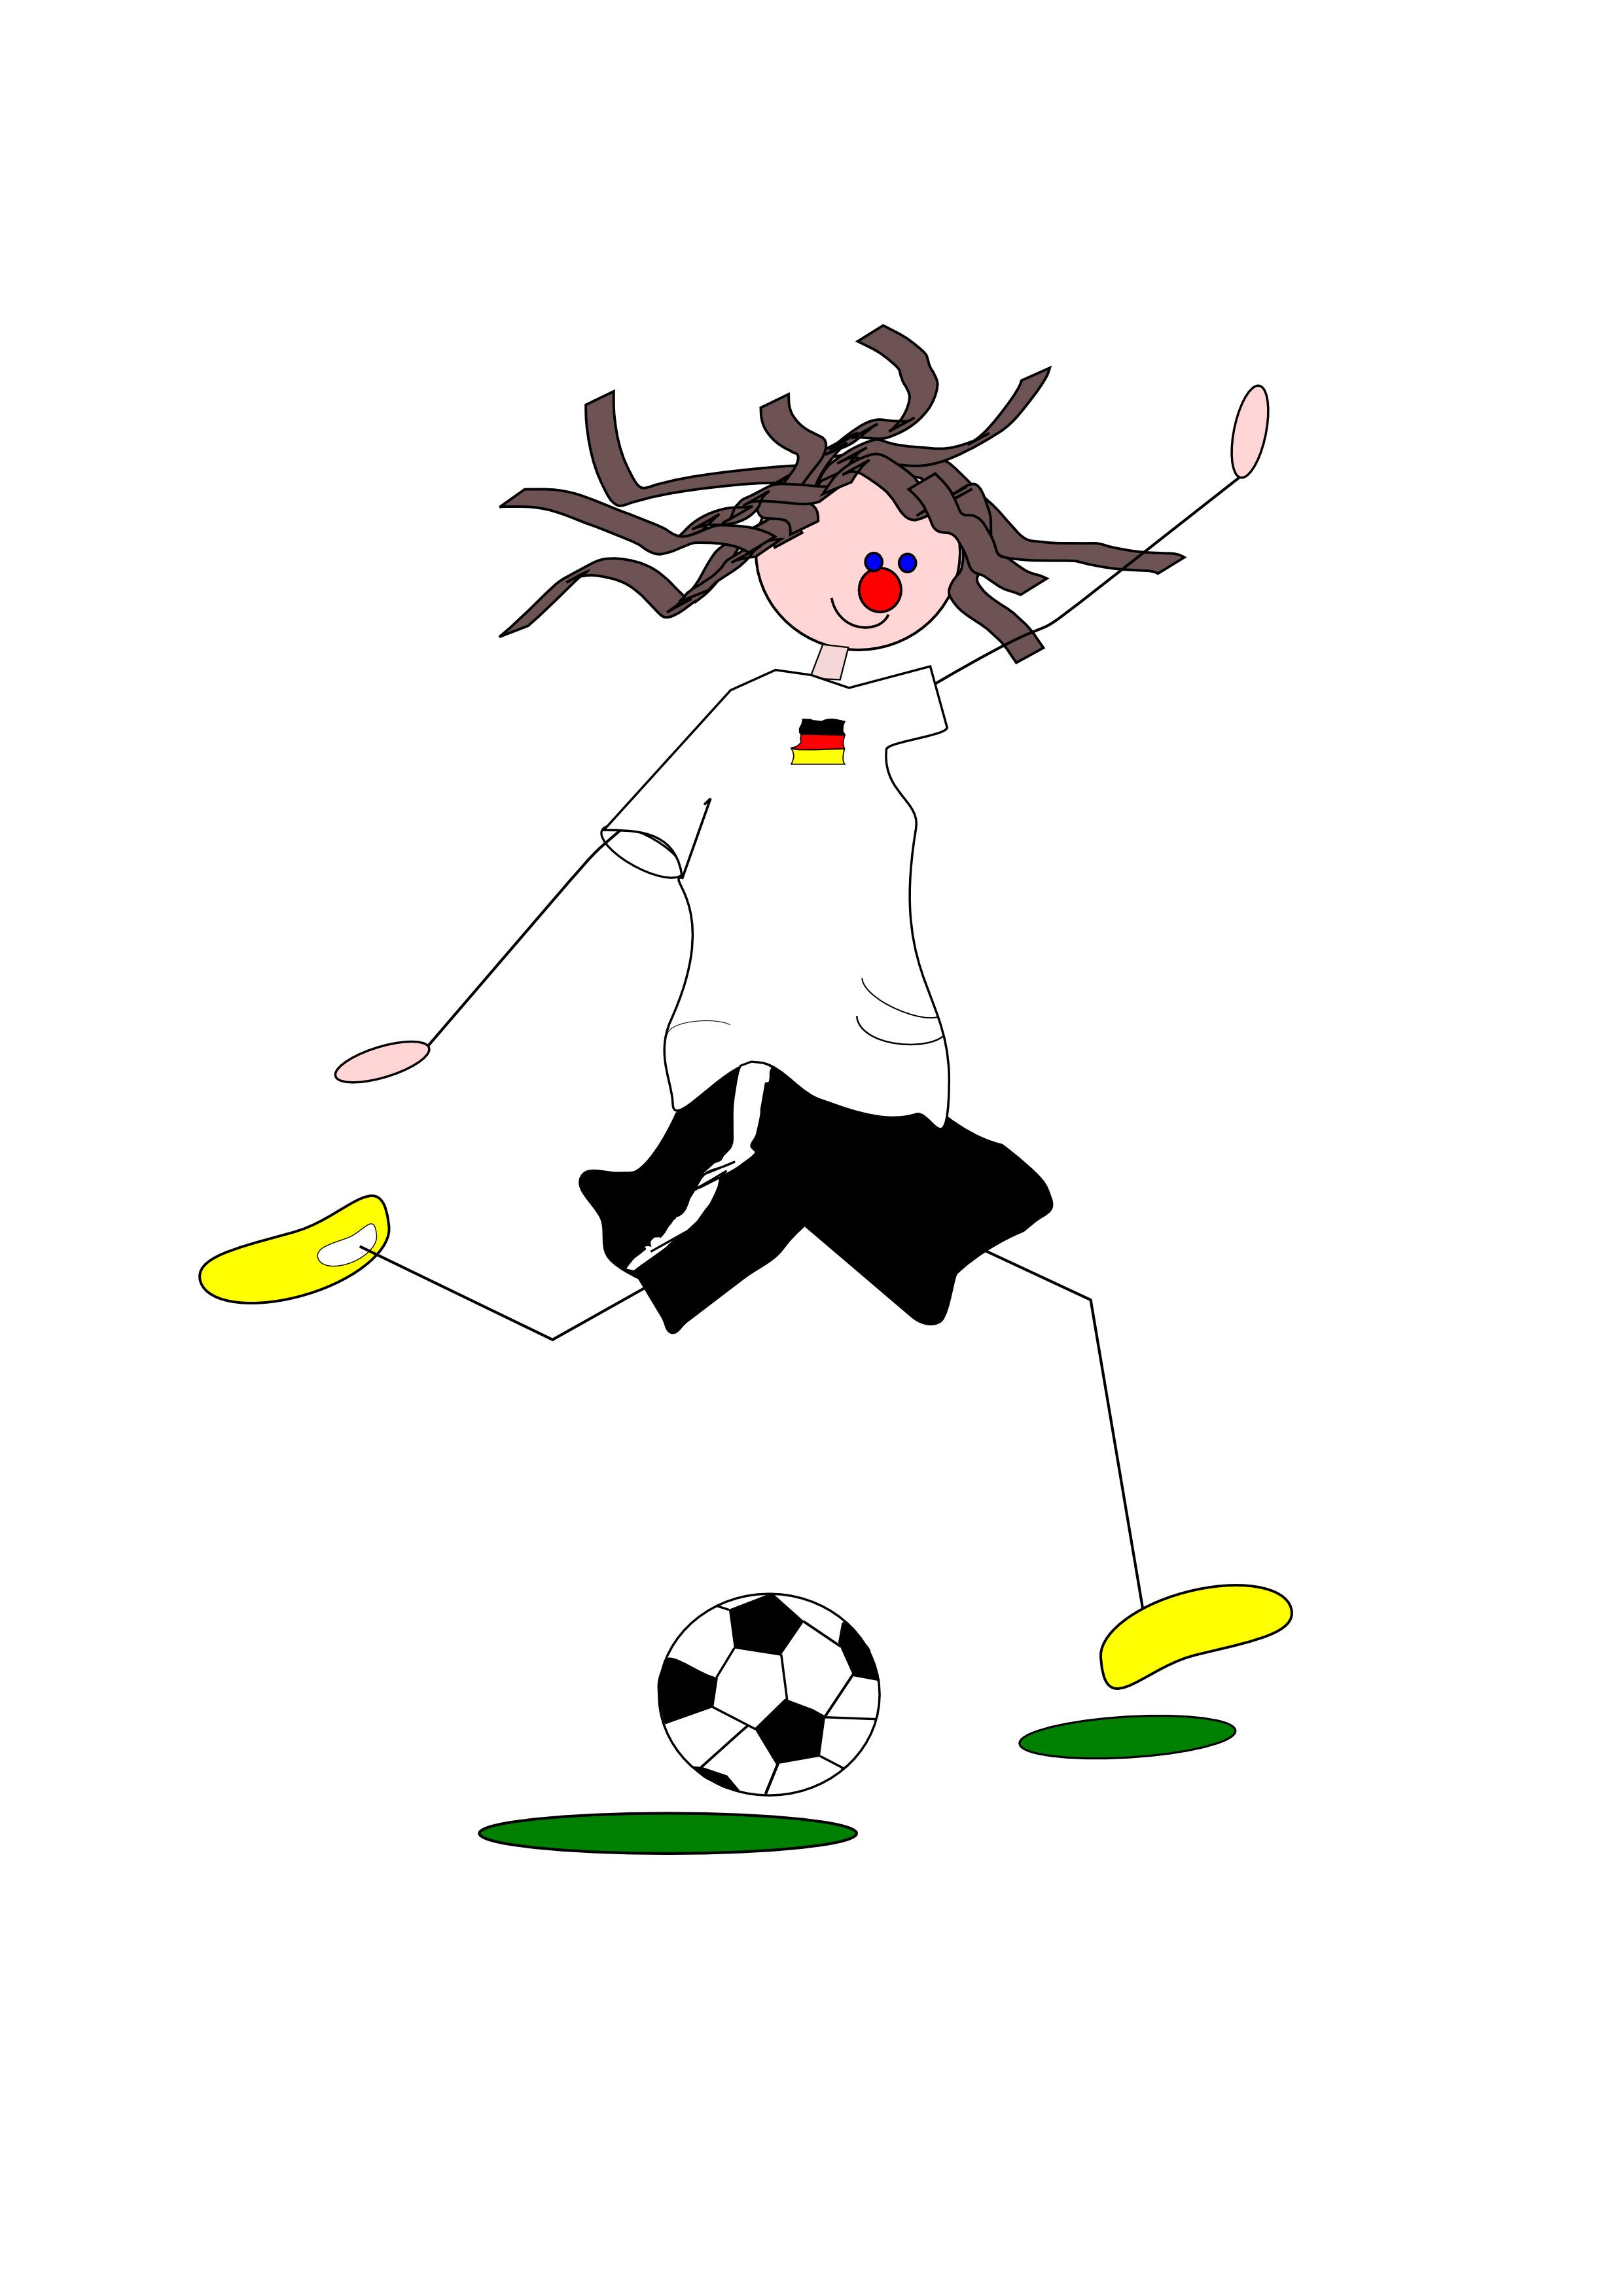 Kicking like Beckham